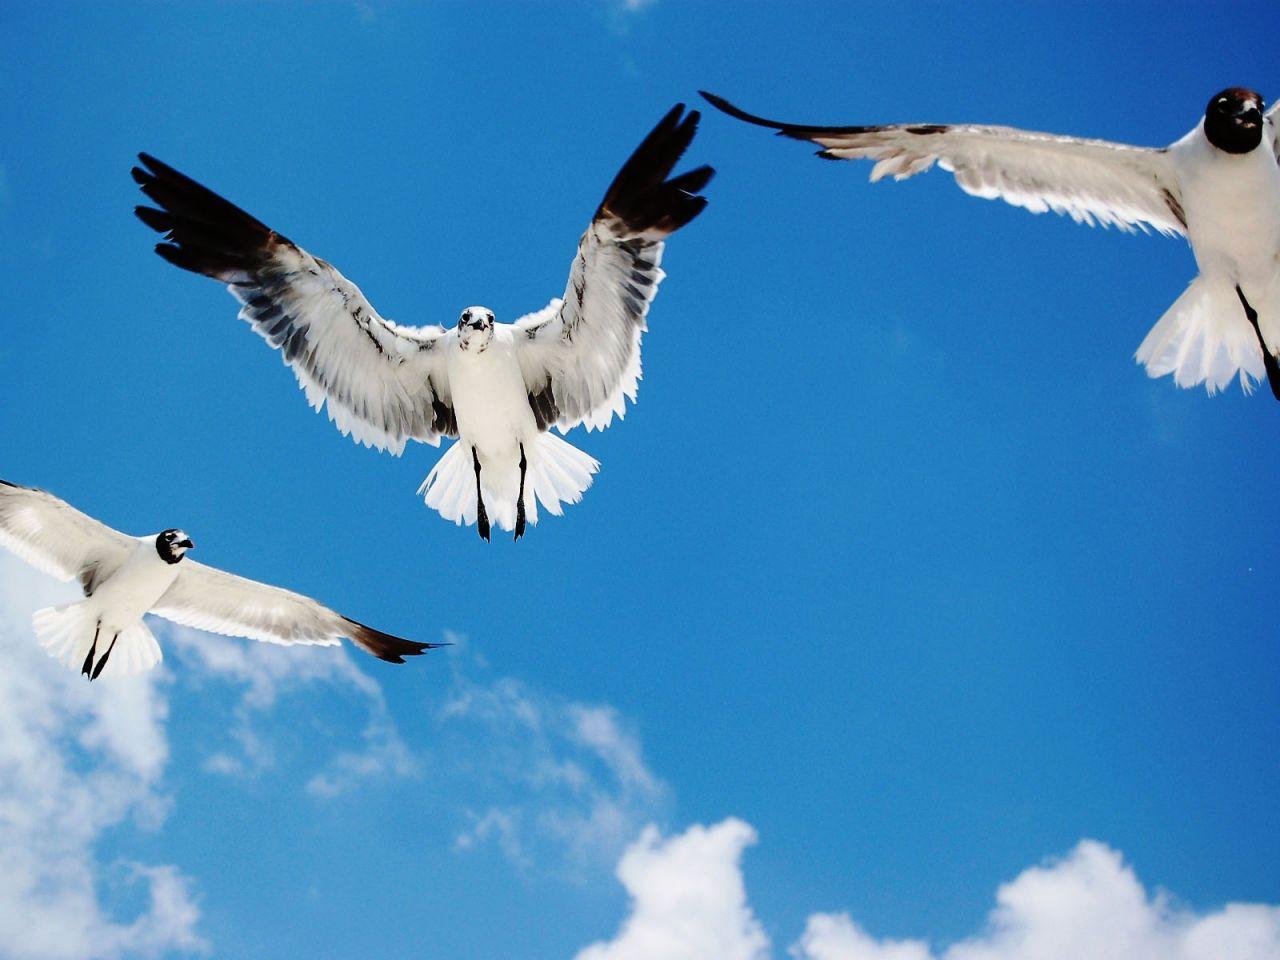 Birds flying in the sky - photo#14